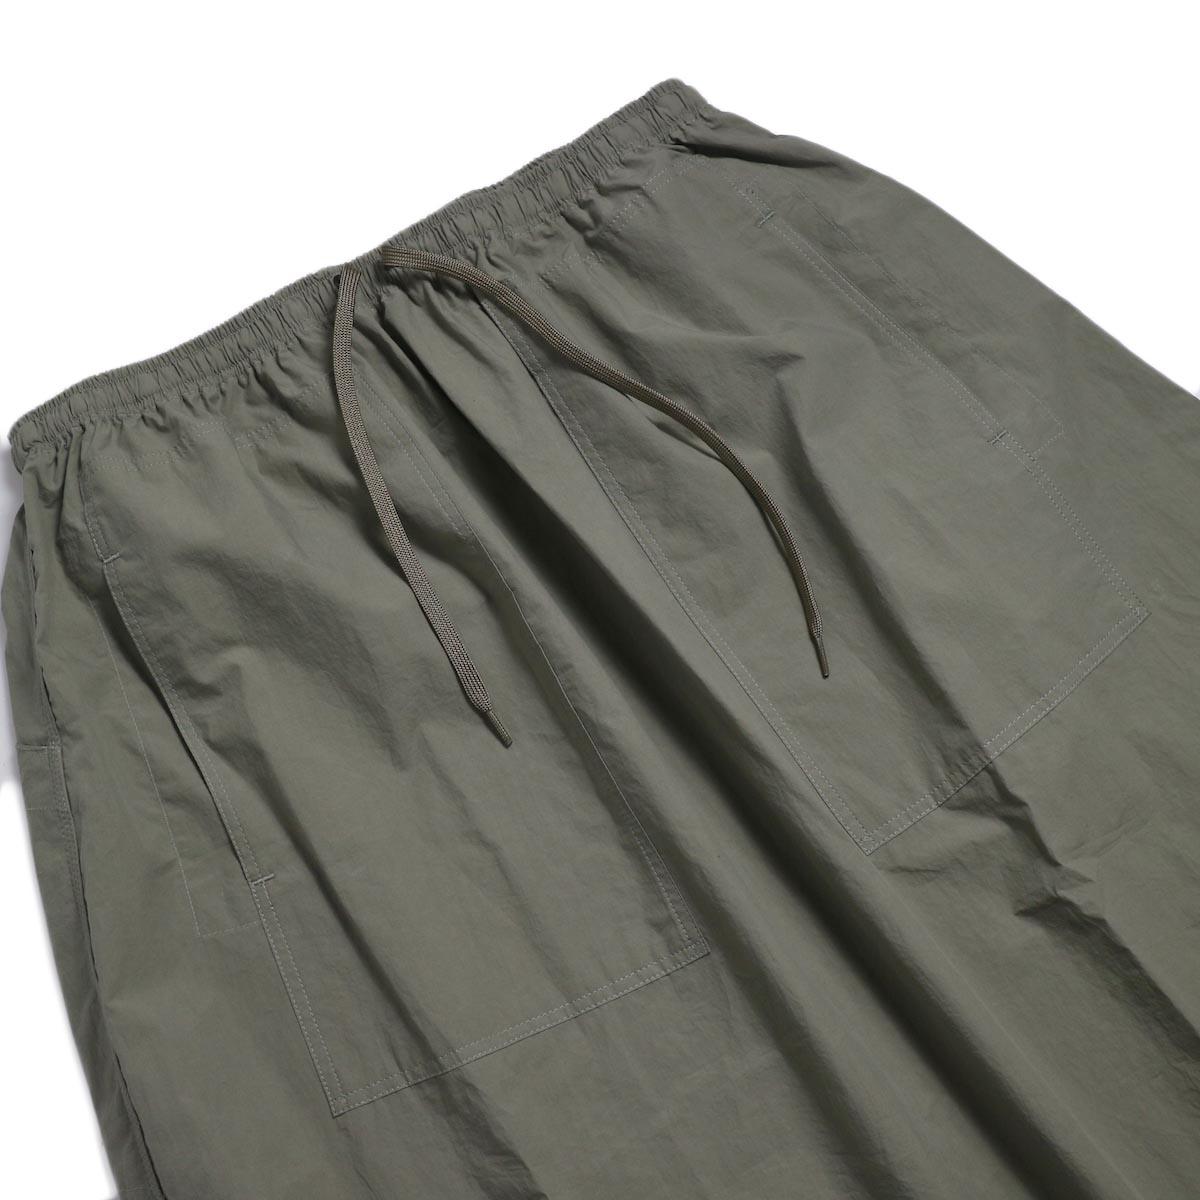 orSlow / Climbing Skirt -Greige ウエスト